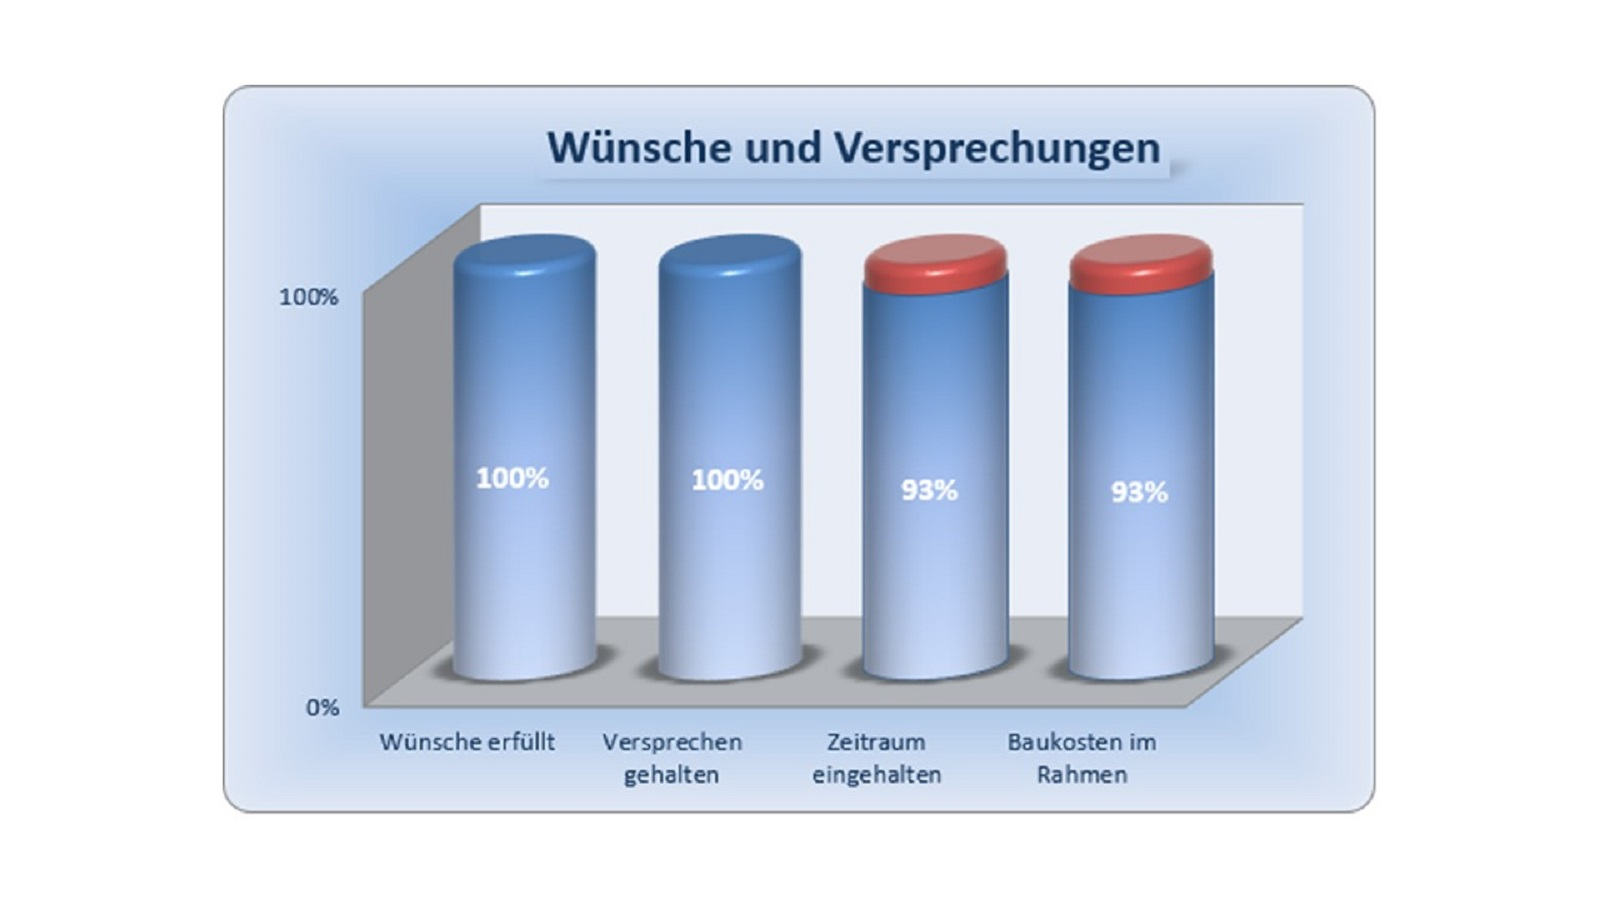 BAUHERRENreport GmbH: Sog statt Druck via Marketing mit Qualitäts-Content